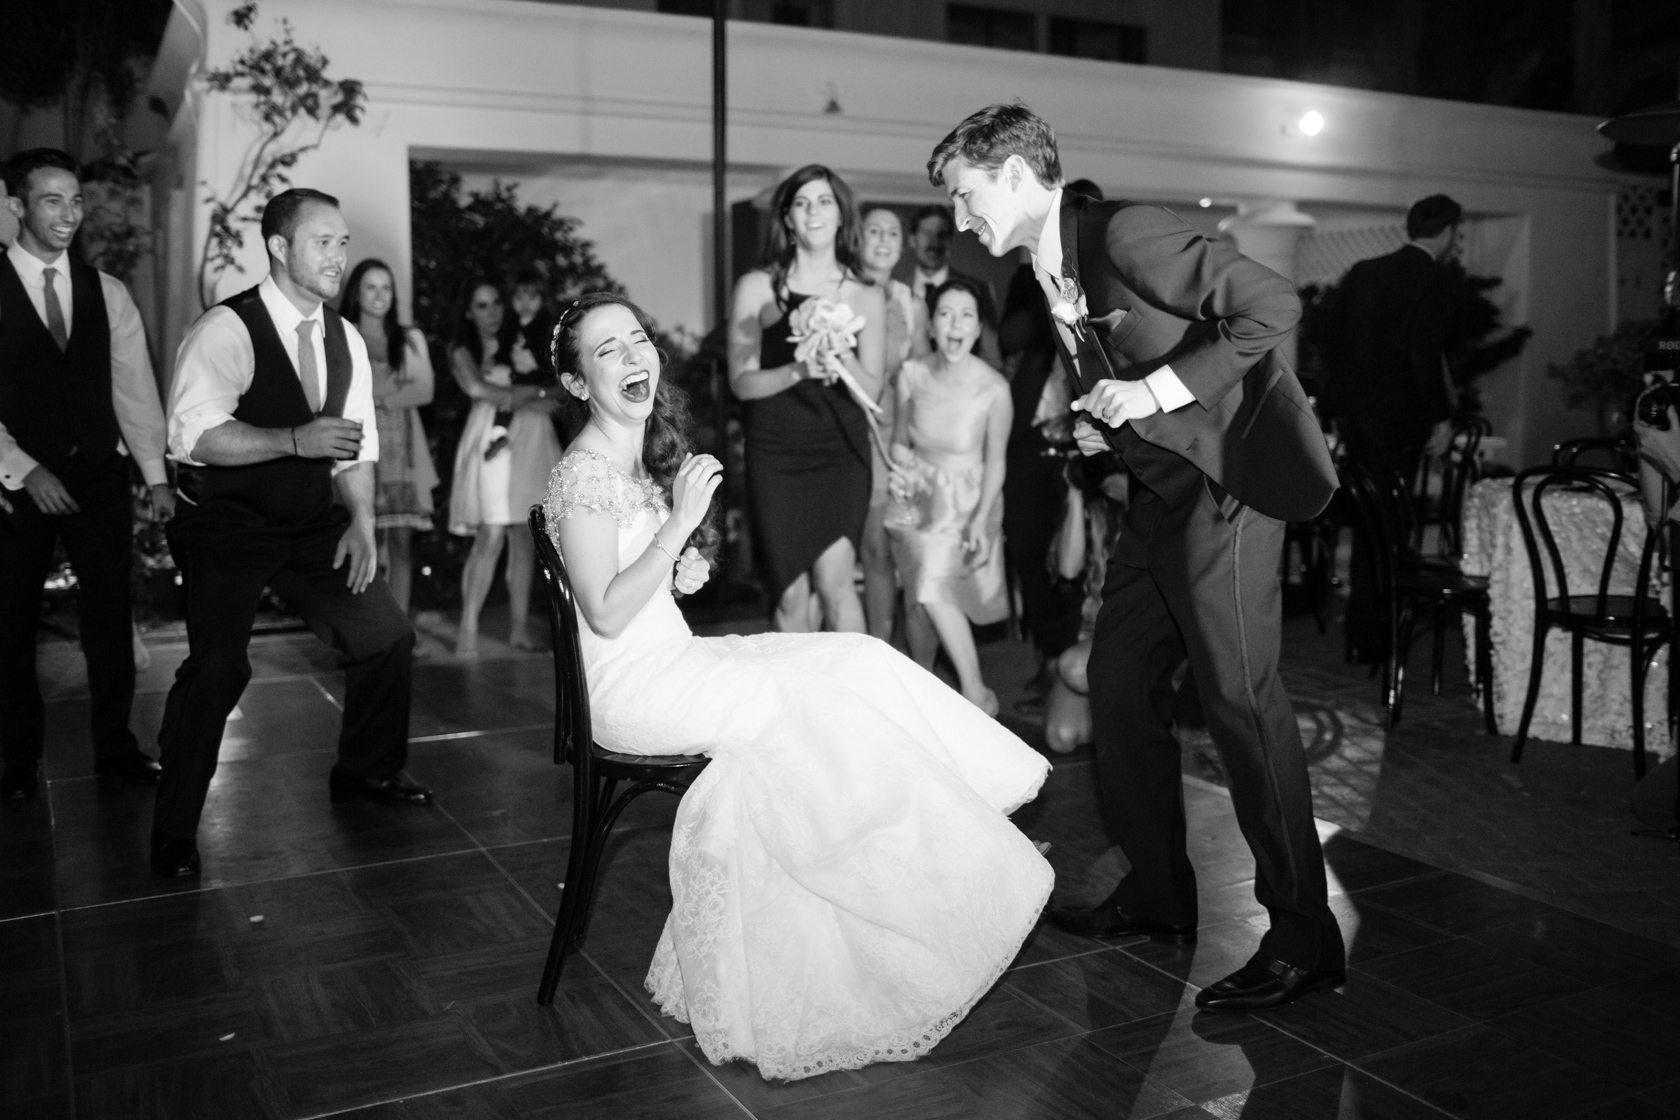 Darlington_House_Wedding_134.jpg